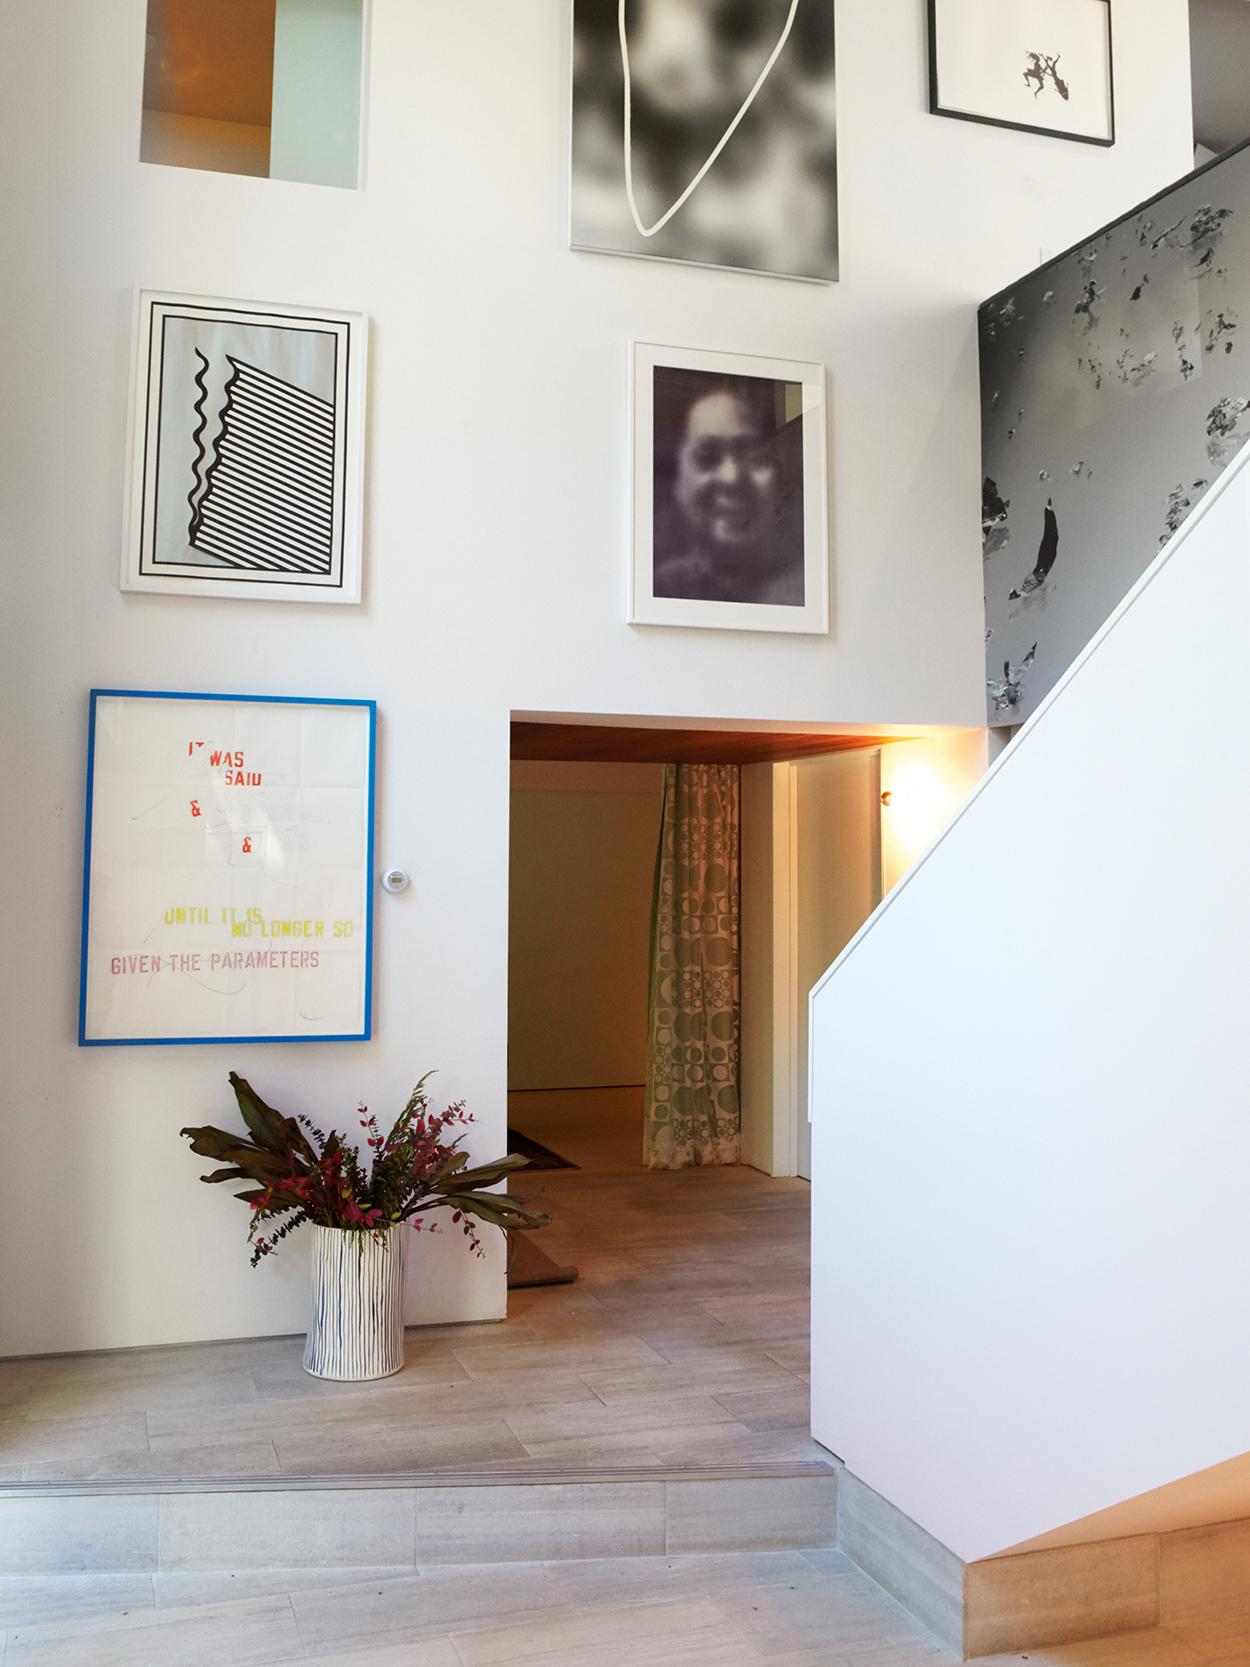 Hallway art by Nicholas Krushenick, Laurence Weiner and Gerhard Richter.